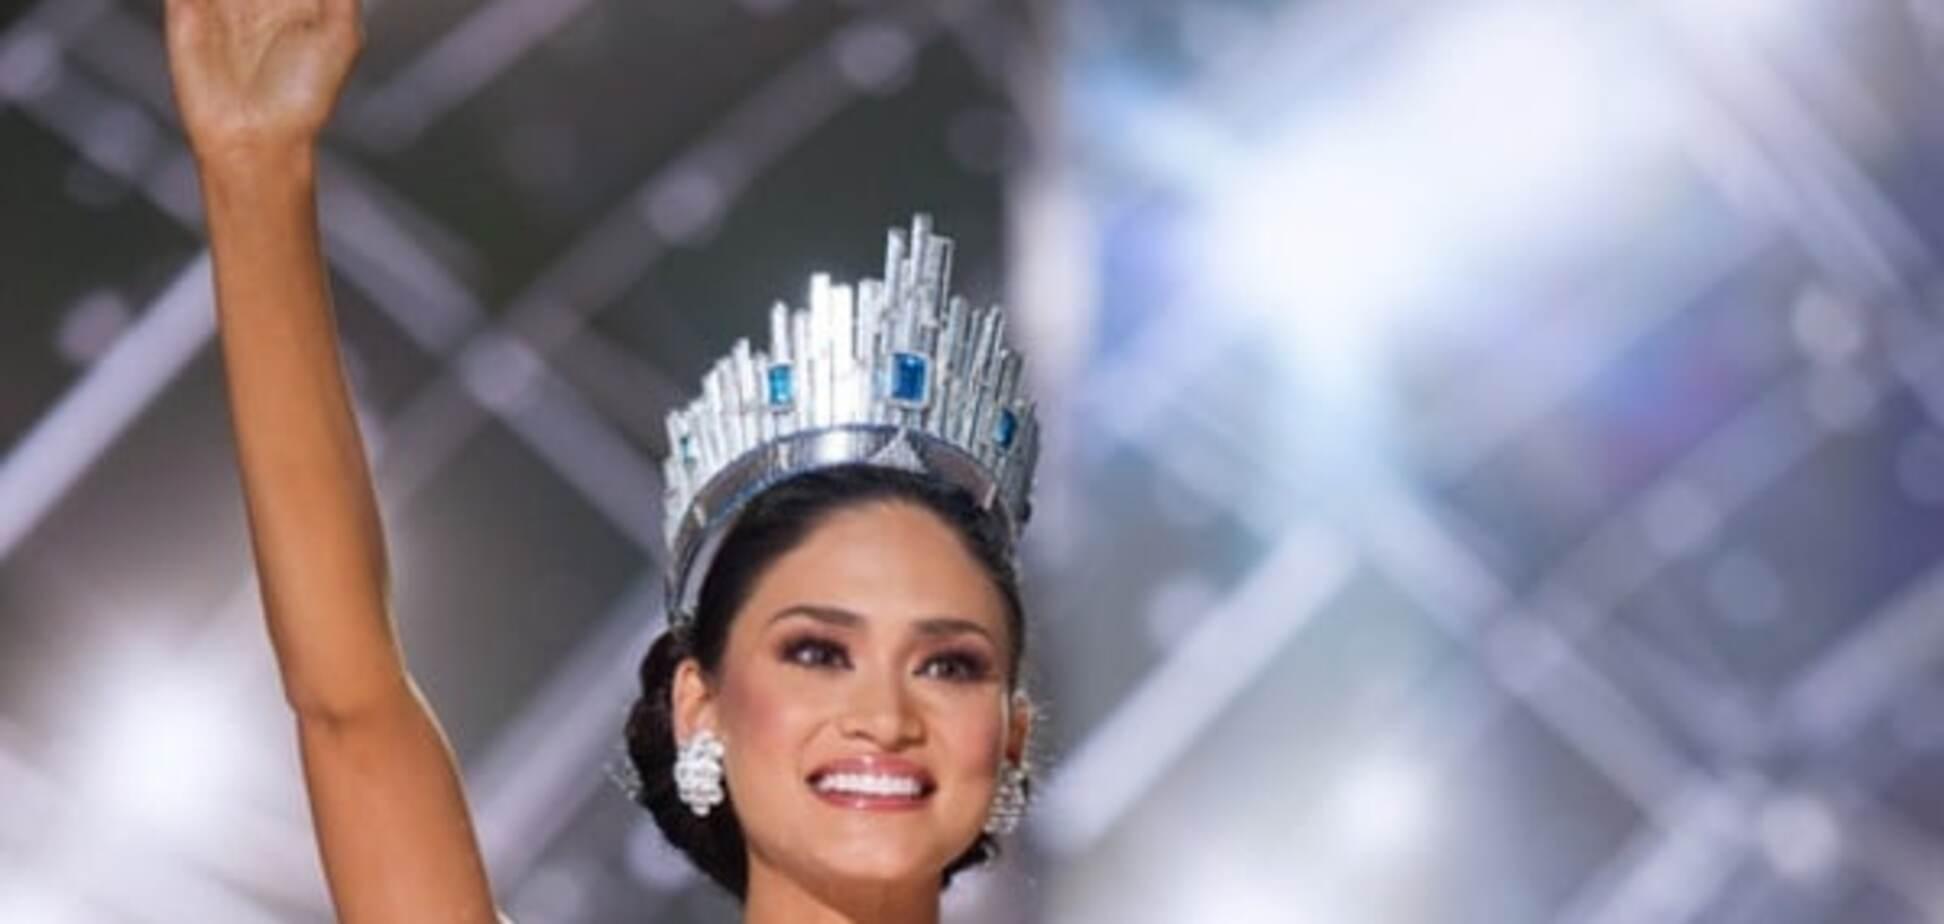 Корона 'Міс Всесвіт-2015' зі скандалом дісталася філіппінці